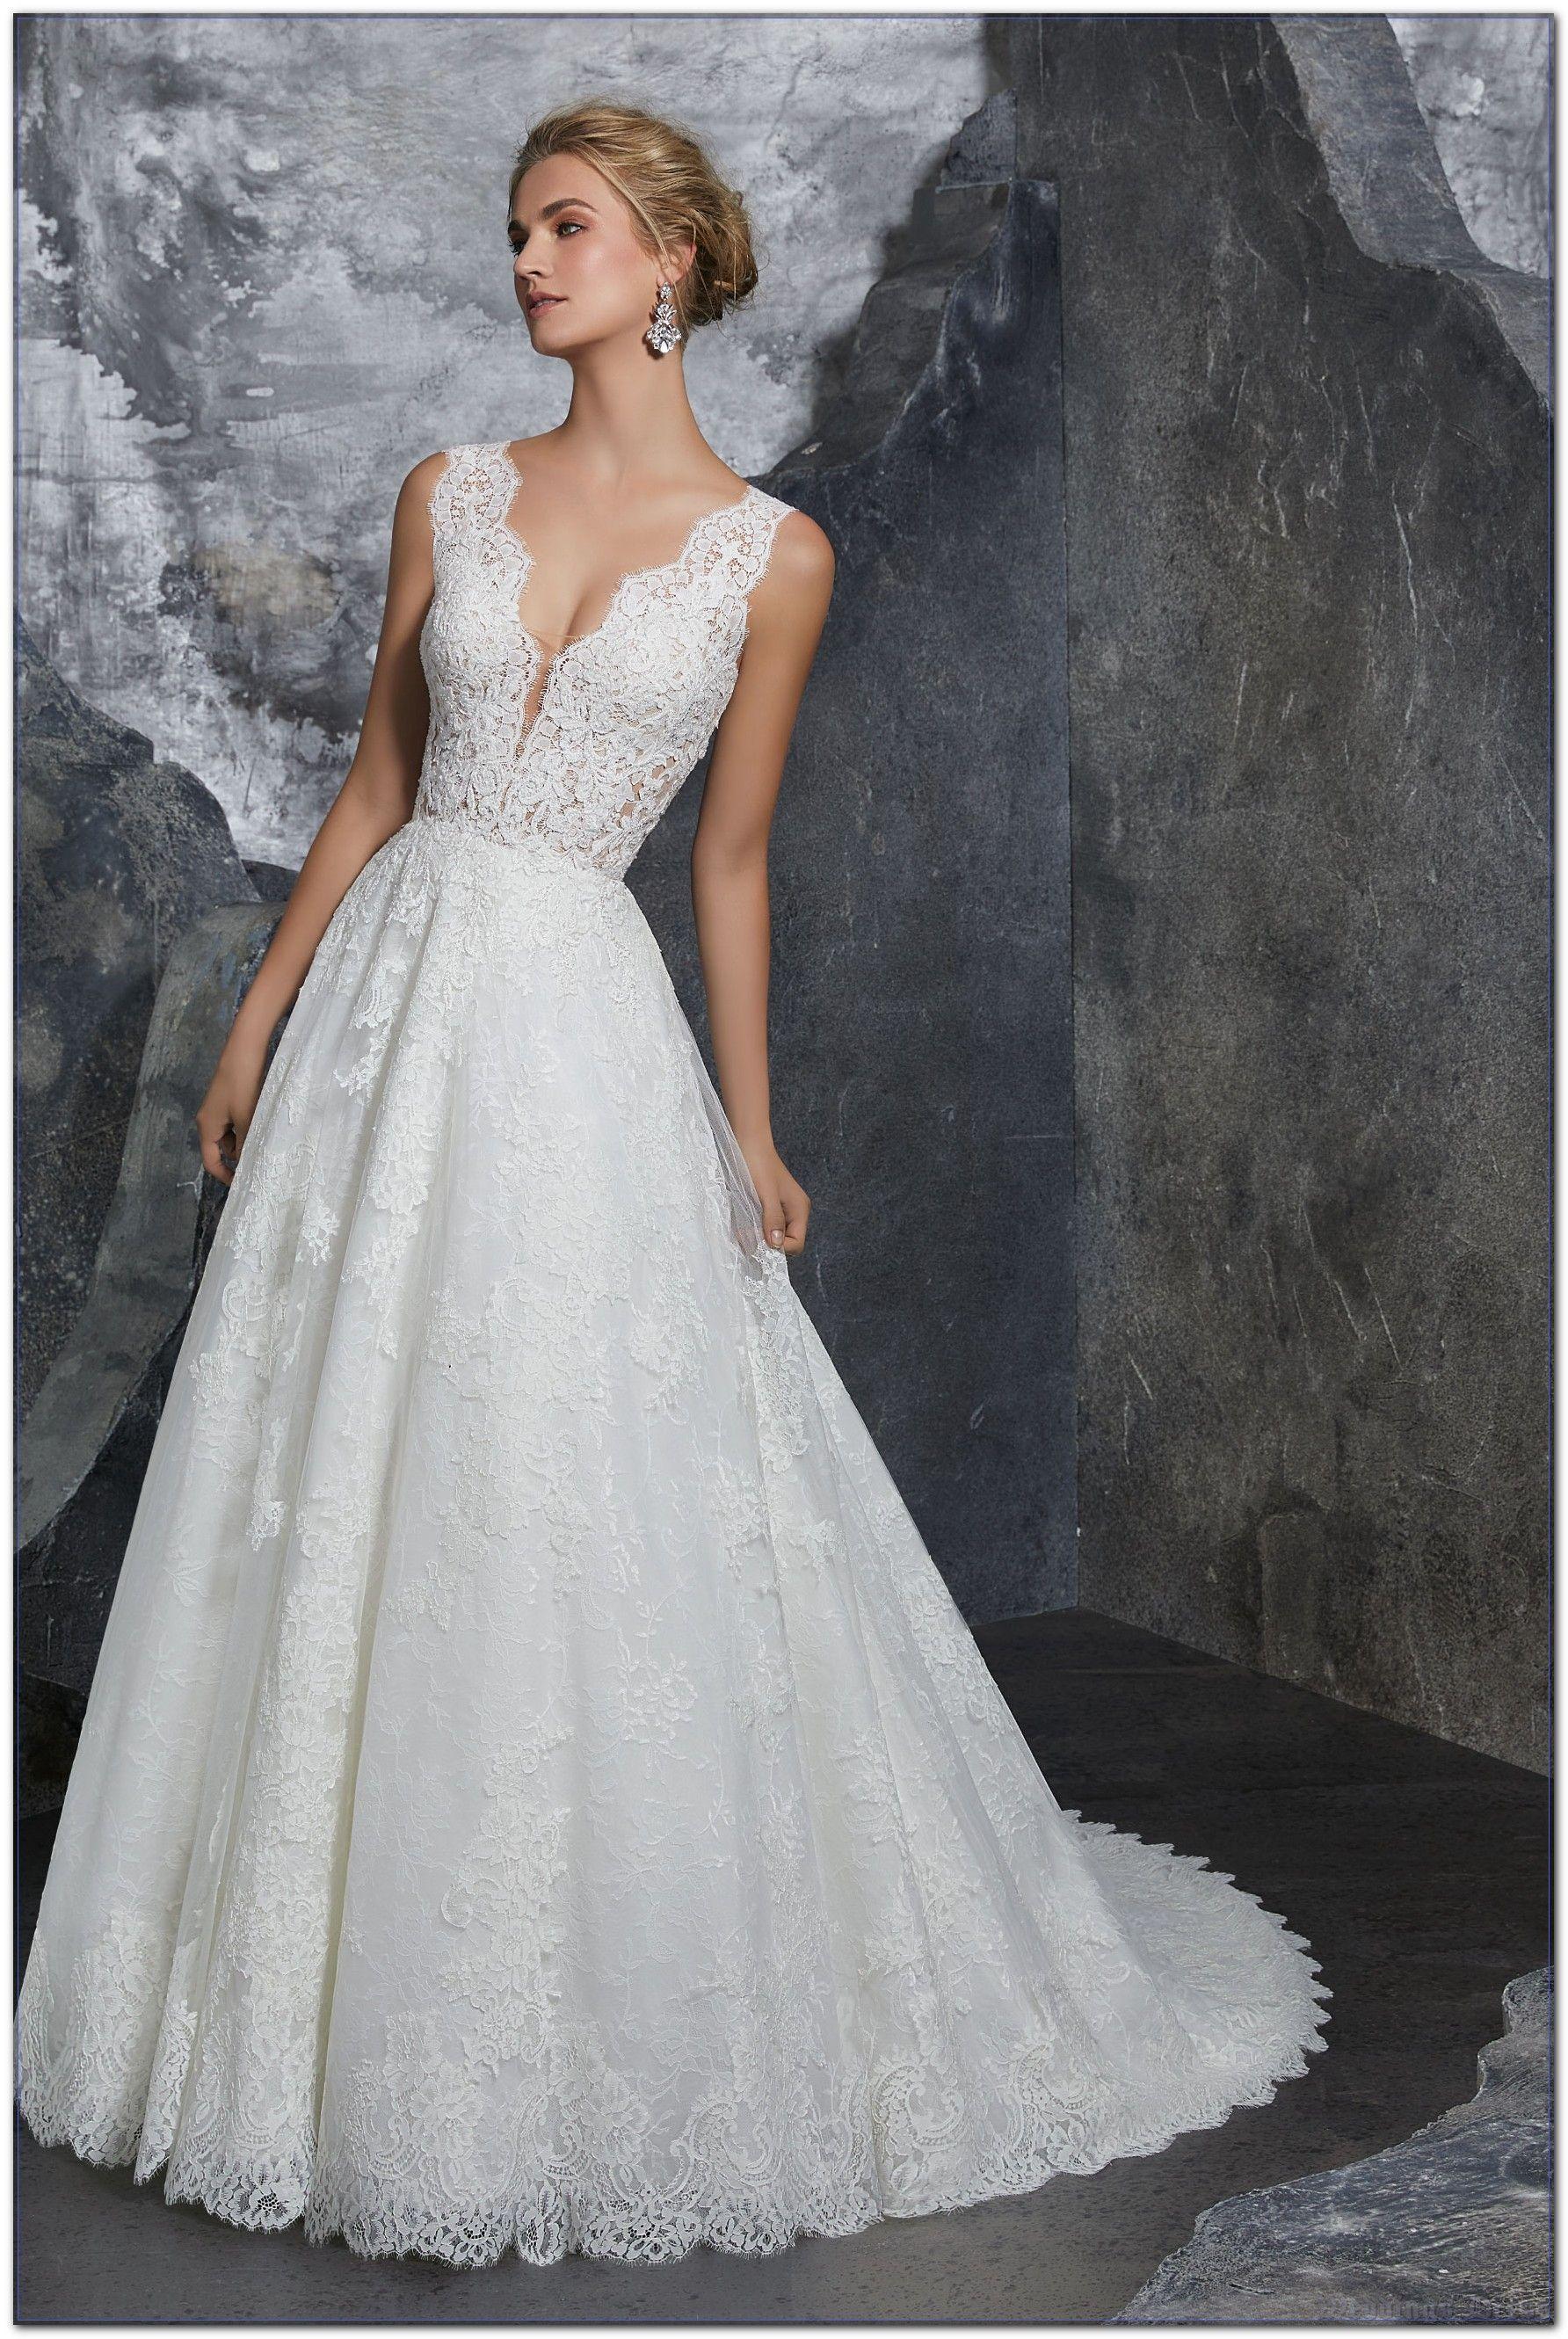 Beware The Weddings Dress Scam